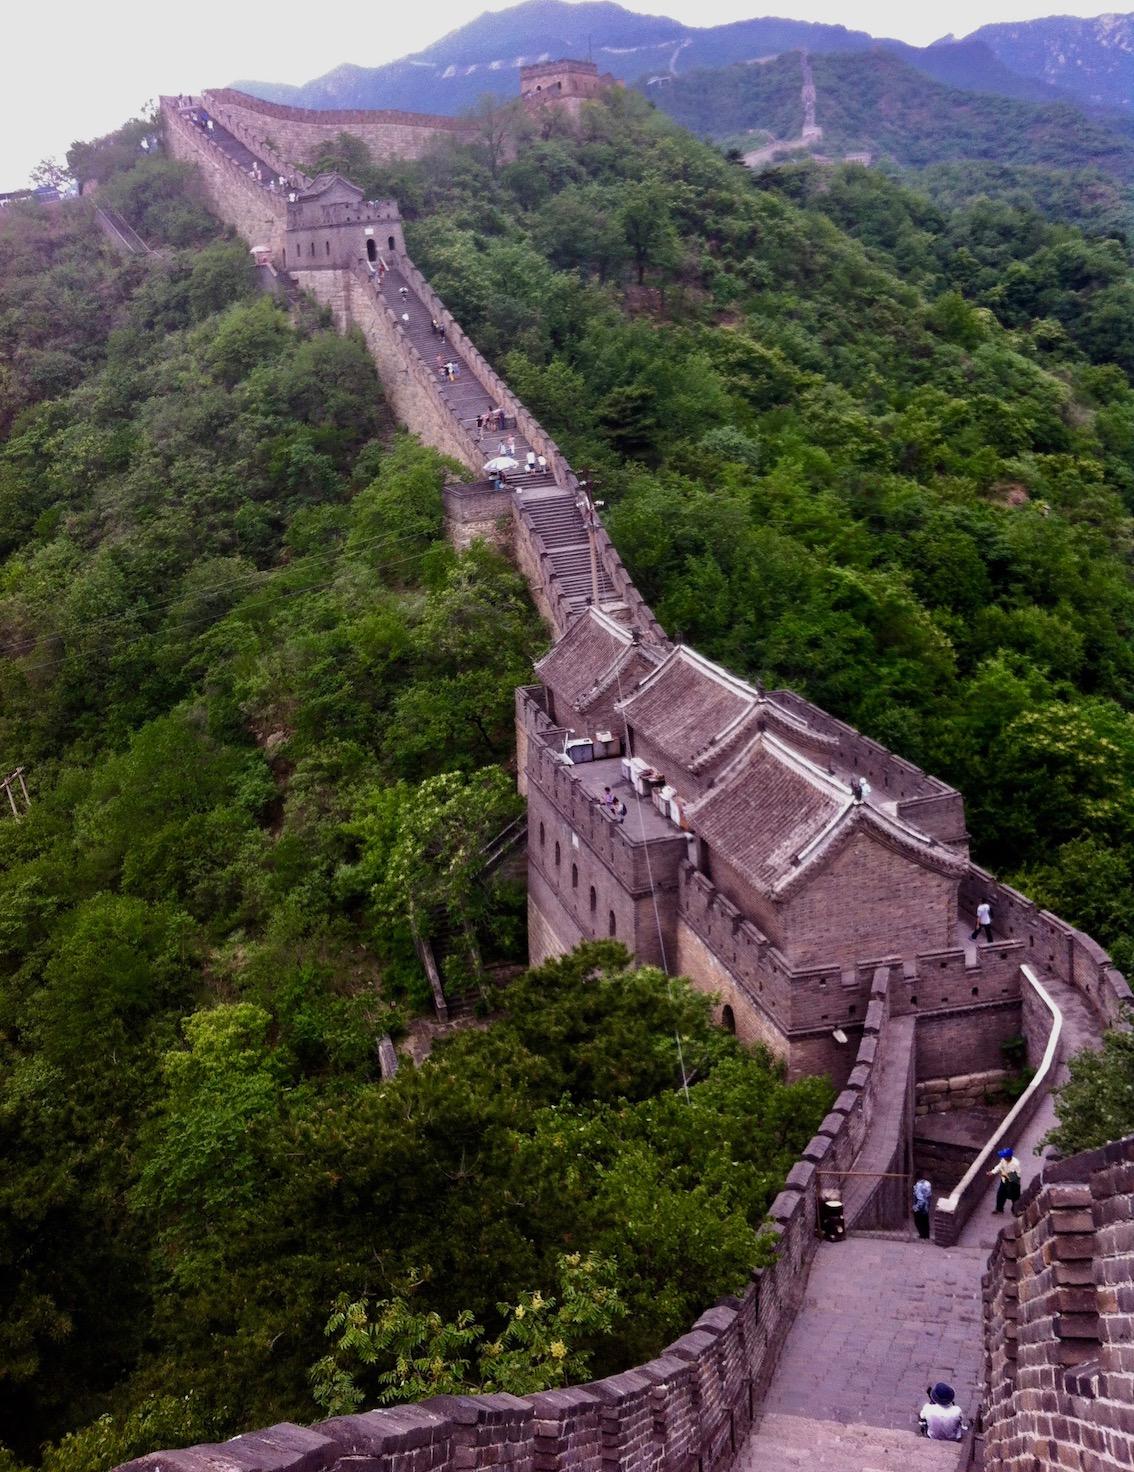 Hike The Great Wall of China Mutianyu